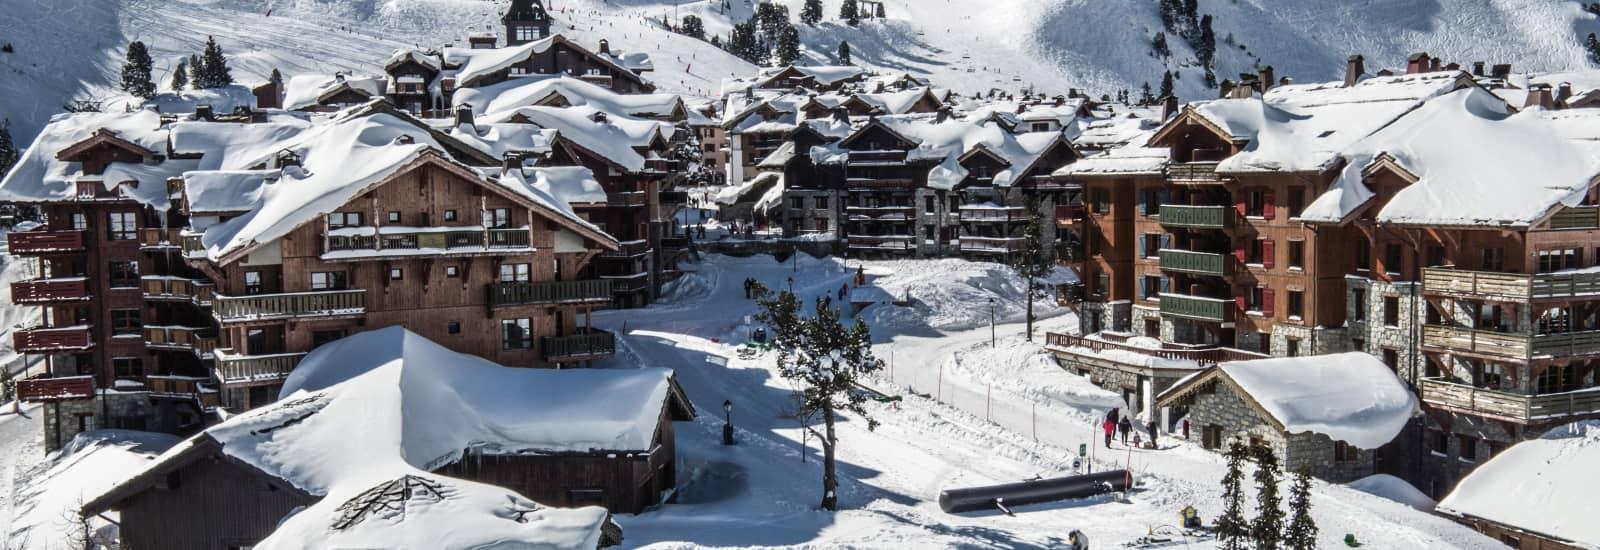 Catered ski chalets les arcs 1950 webcam